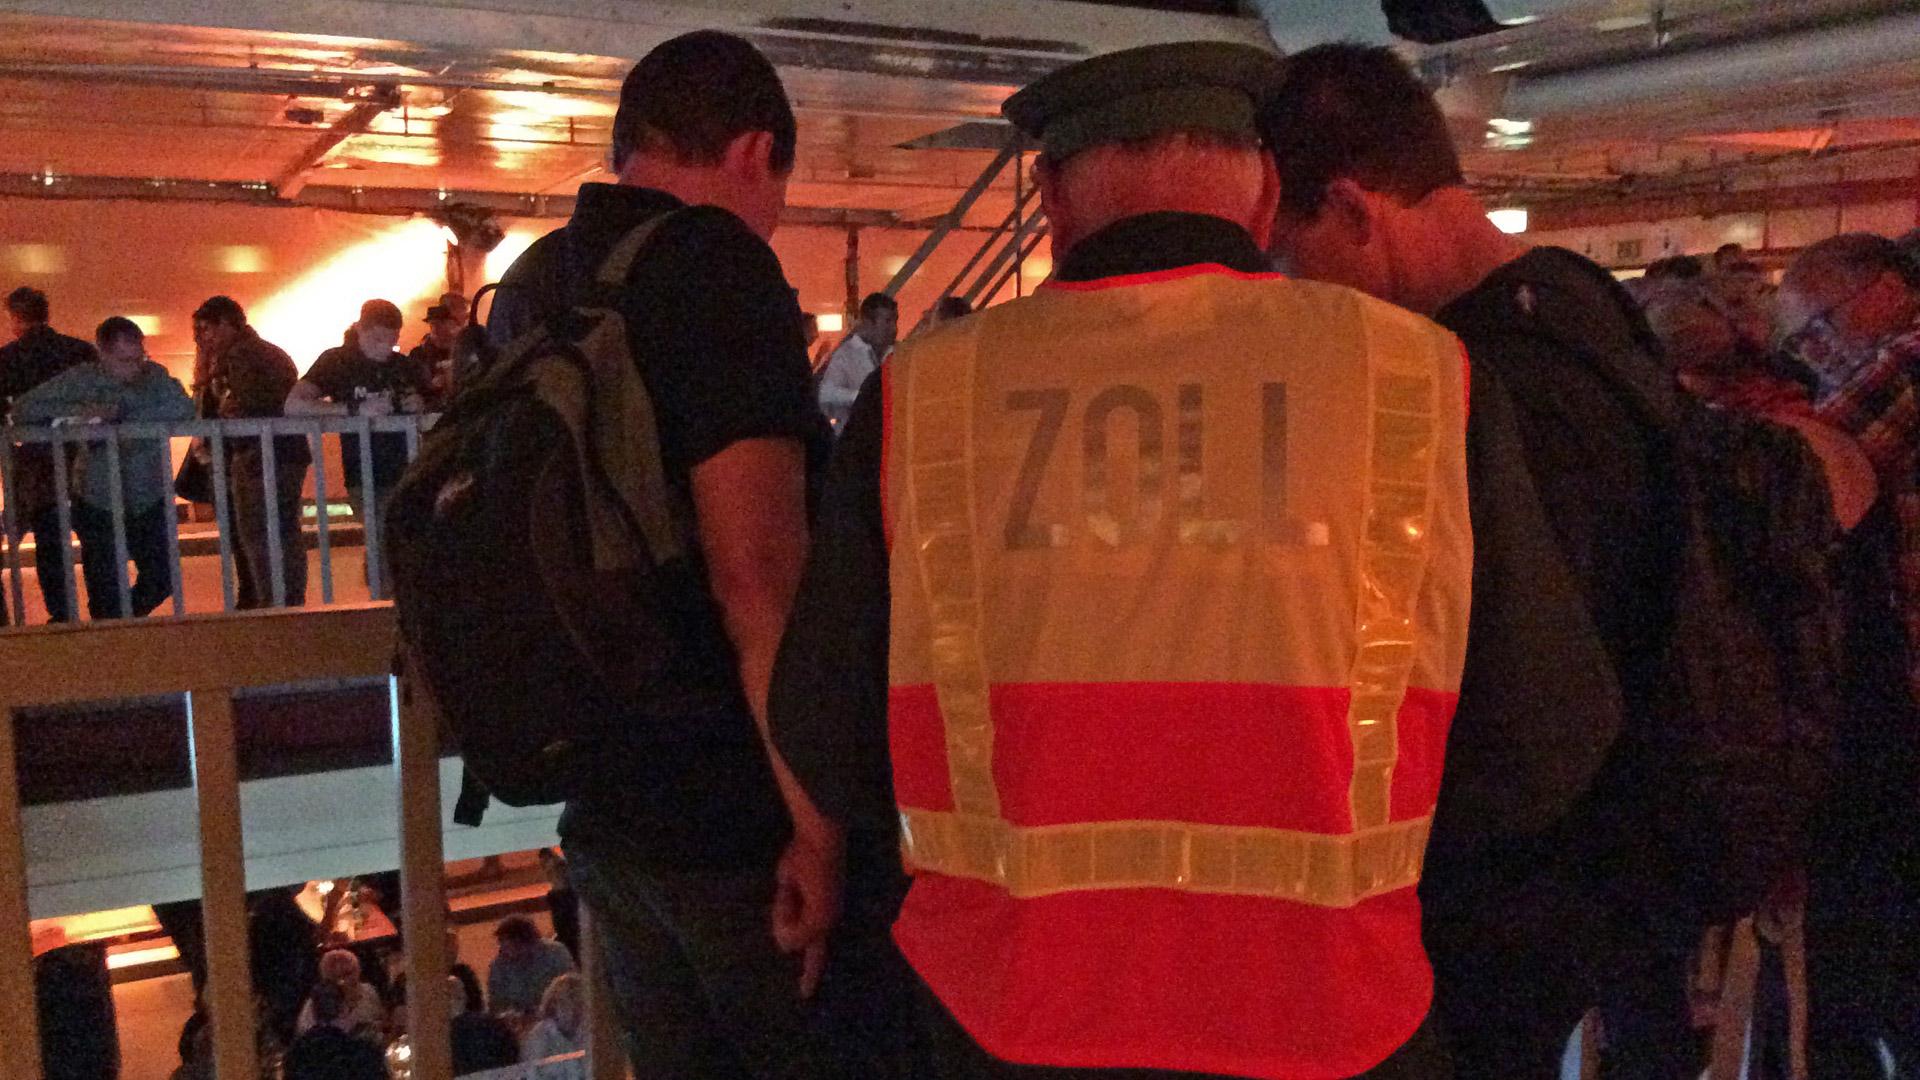 Harmlose Ardbeg-Jünger unter Fahndungsdruck der Zöllner. Kann der Ardbeg Dark Cove erfolgreich an Bord geschmuggelt werden? (Foto: Malt Whisky)